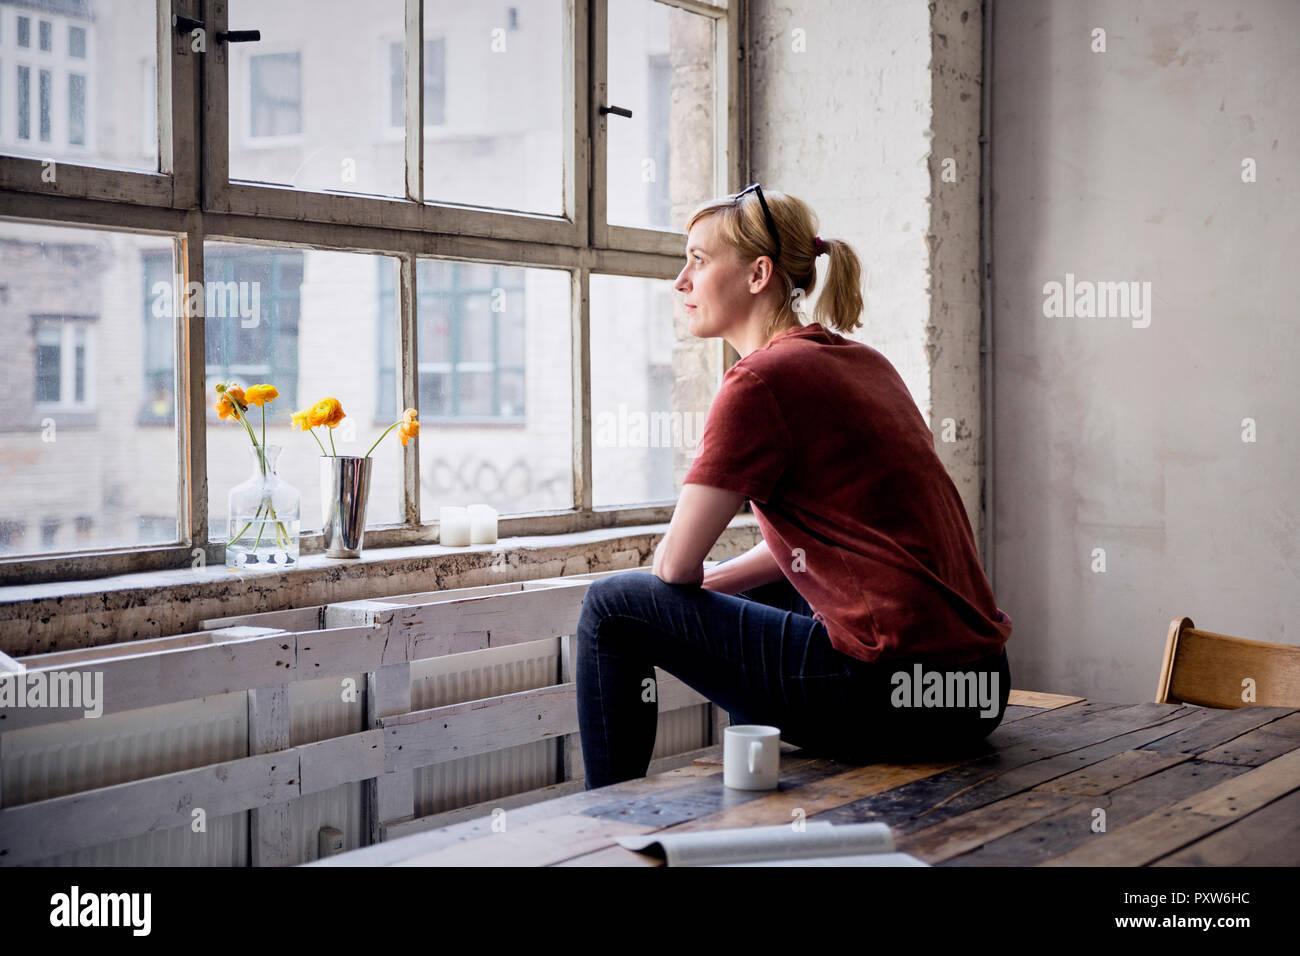 Woman sitting on desk in loft looking through window - Stock Image